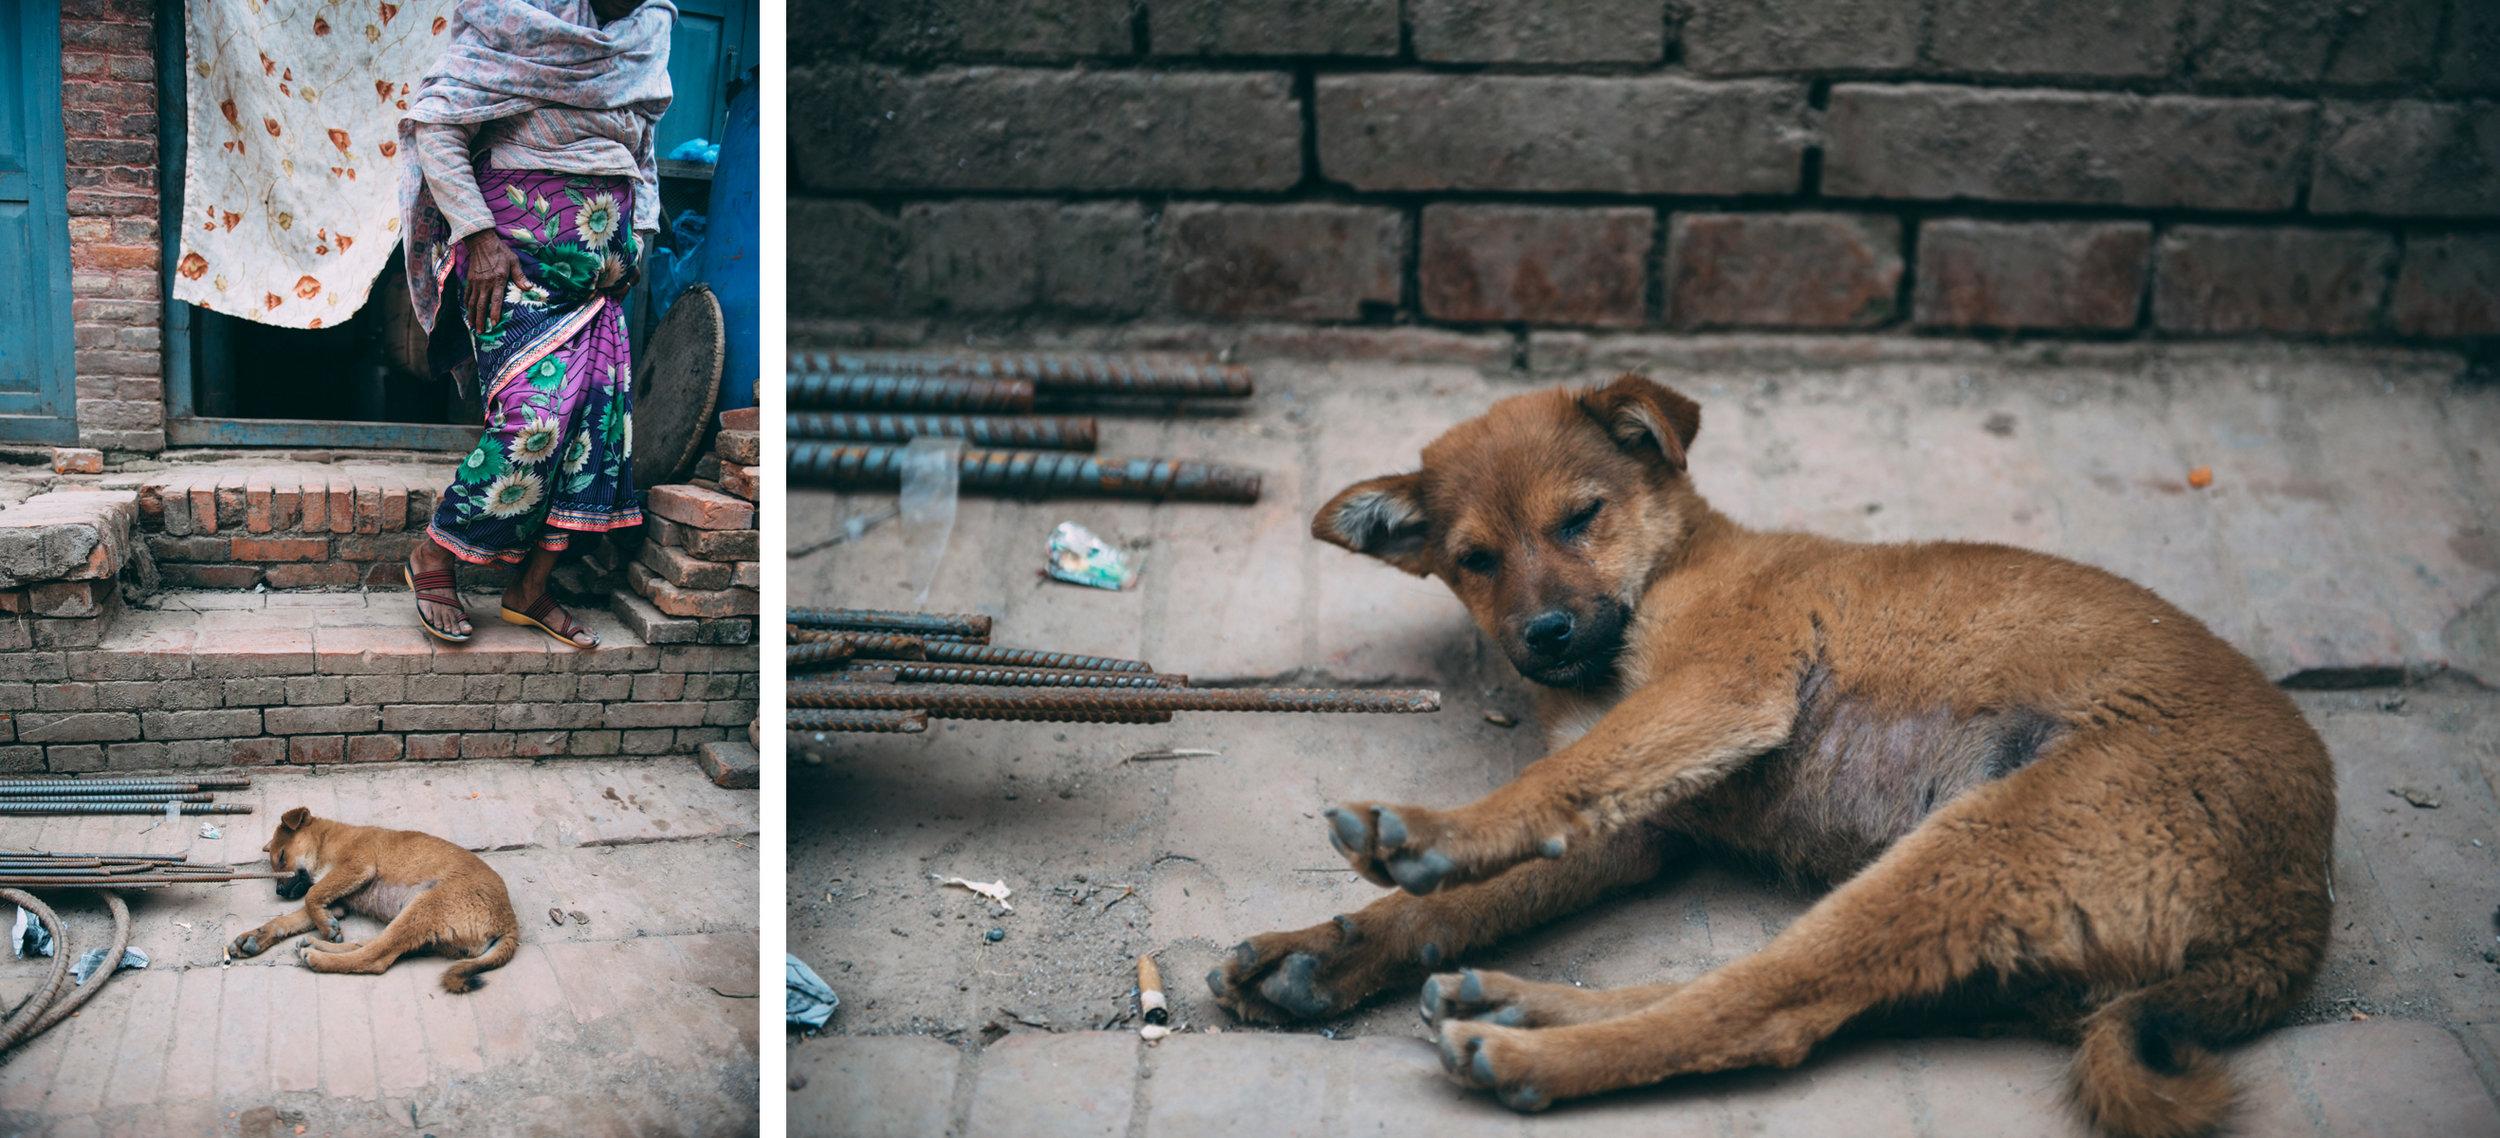 26-Nepal-Blog-Lola-Photography_001.jpg